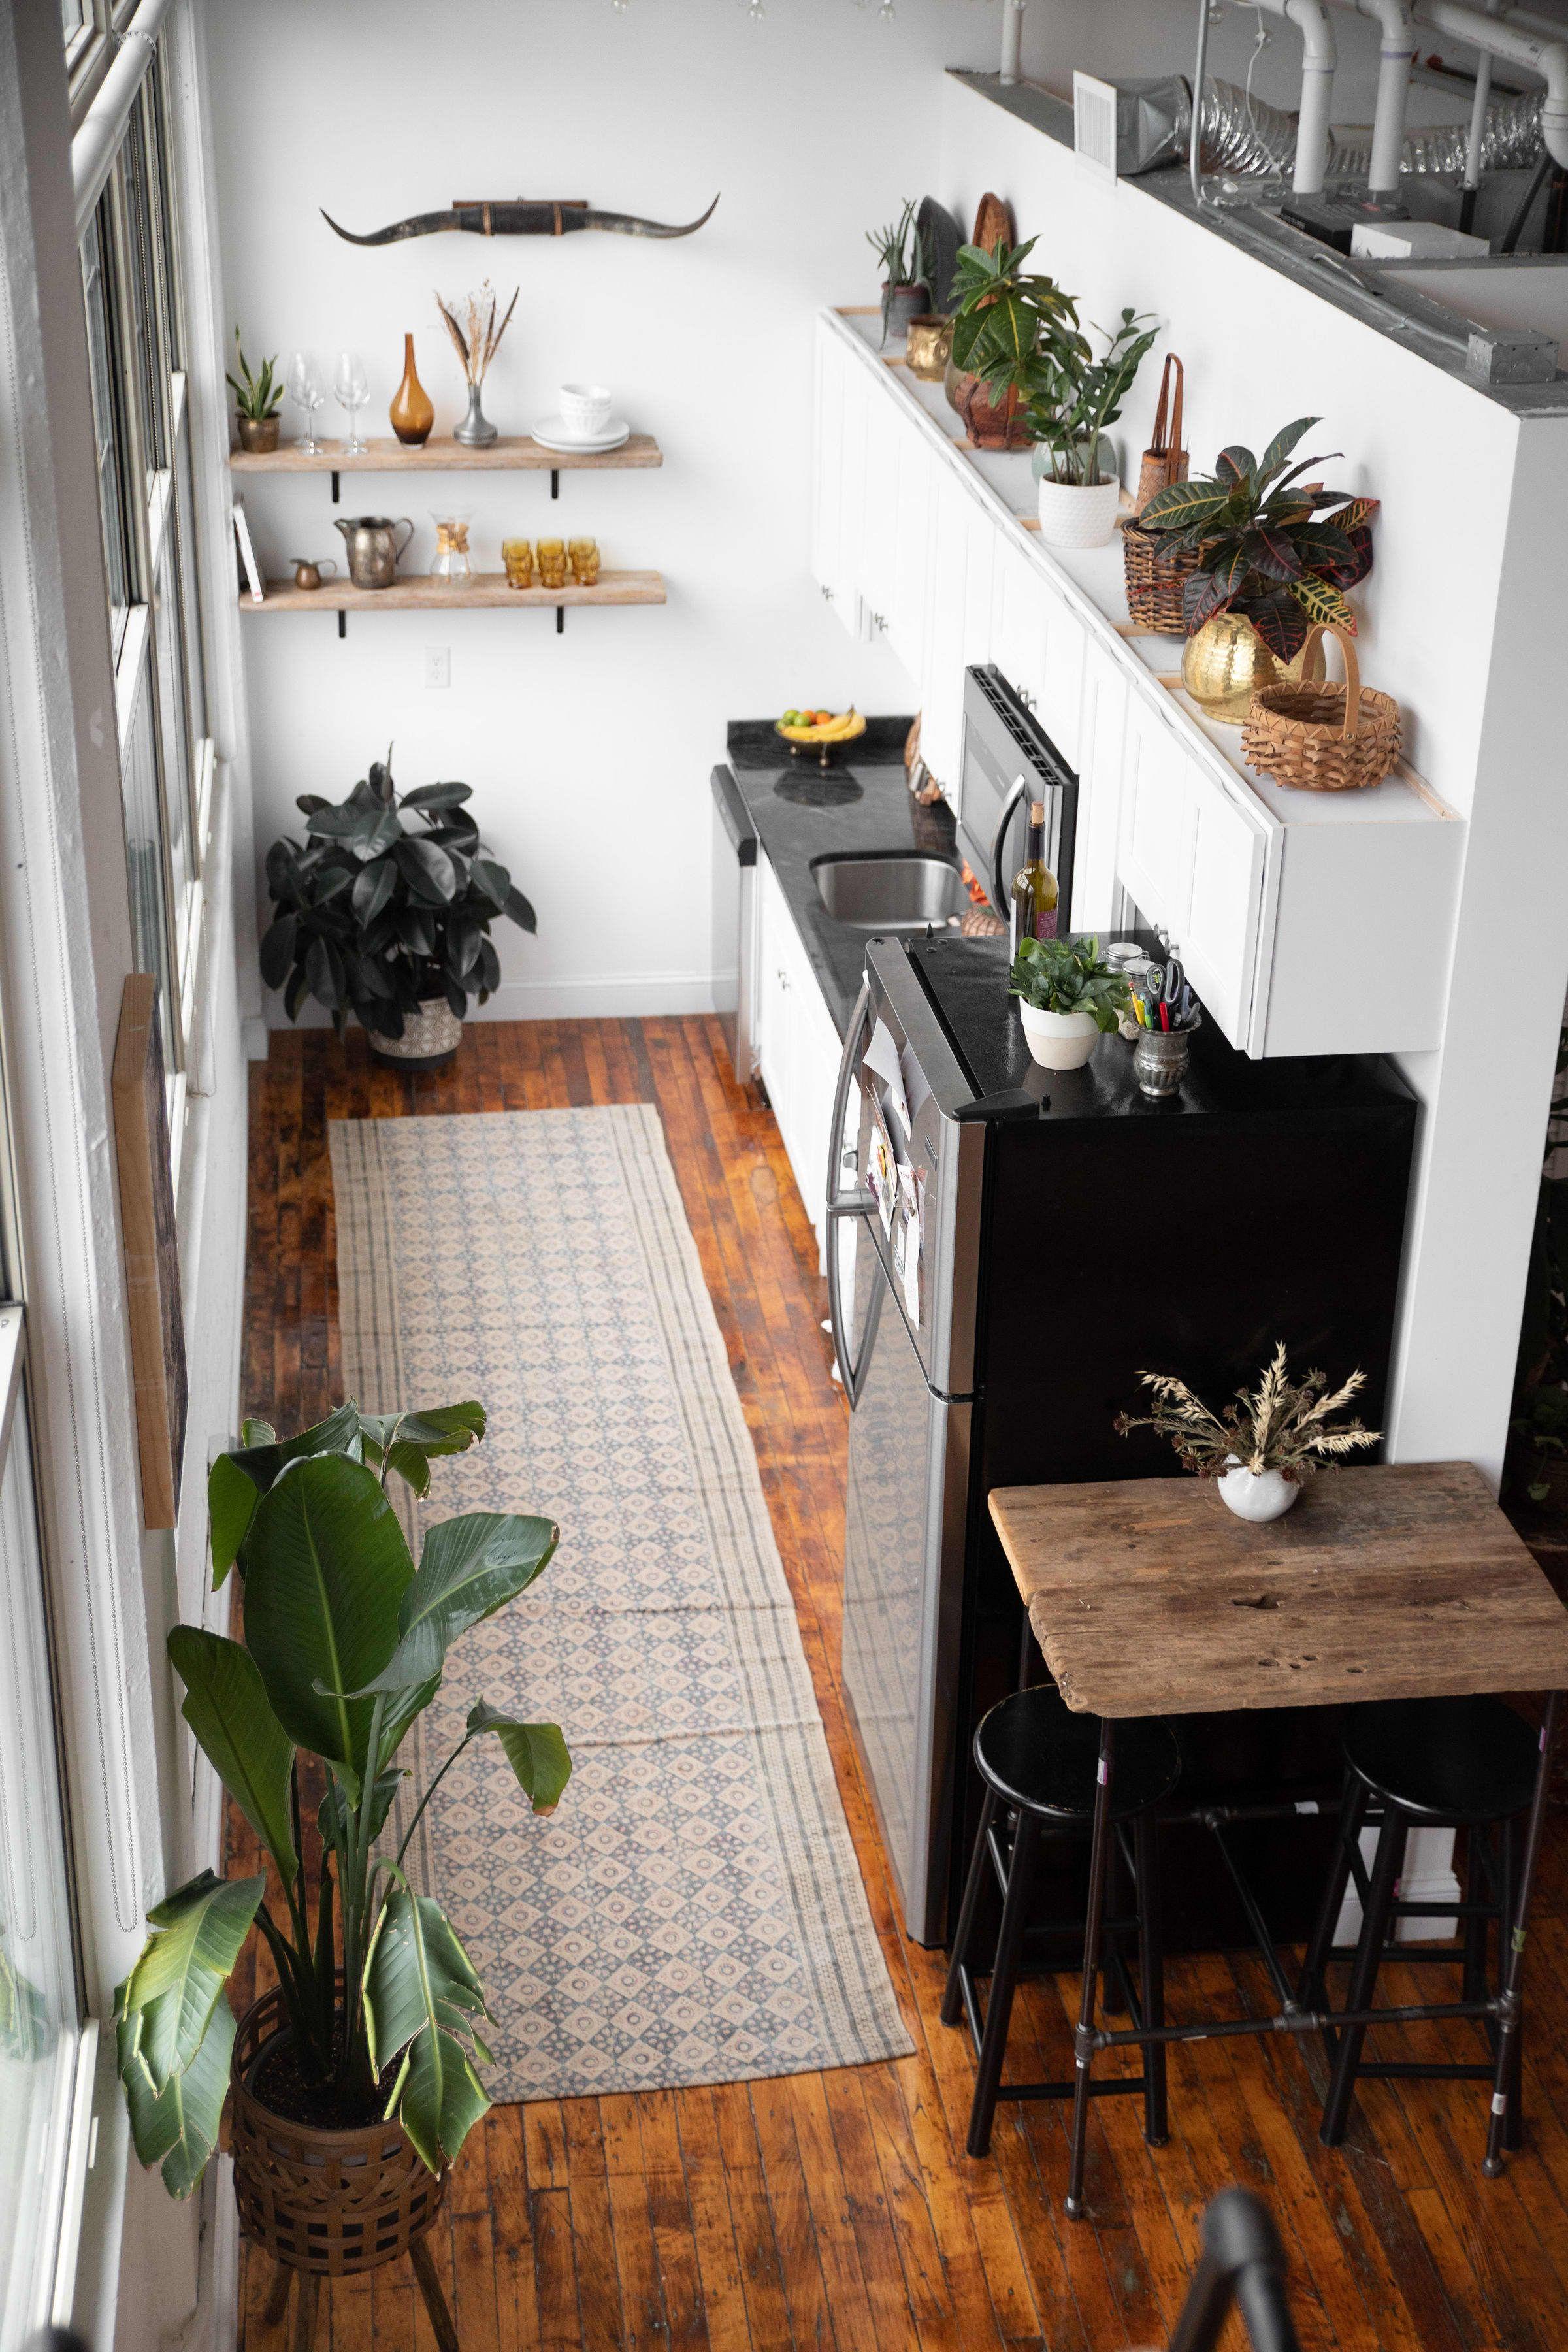 A Beautiful 600 Square Foot Studio Was Furnished On A Small Budget Kitchen Design Small Kitchen Interior Apartment Interior Design